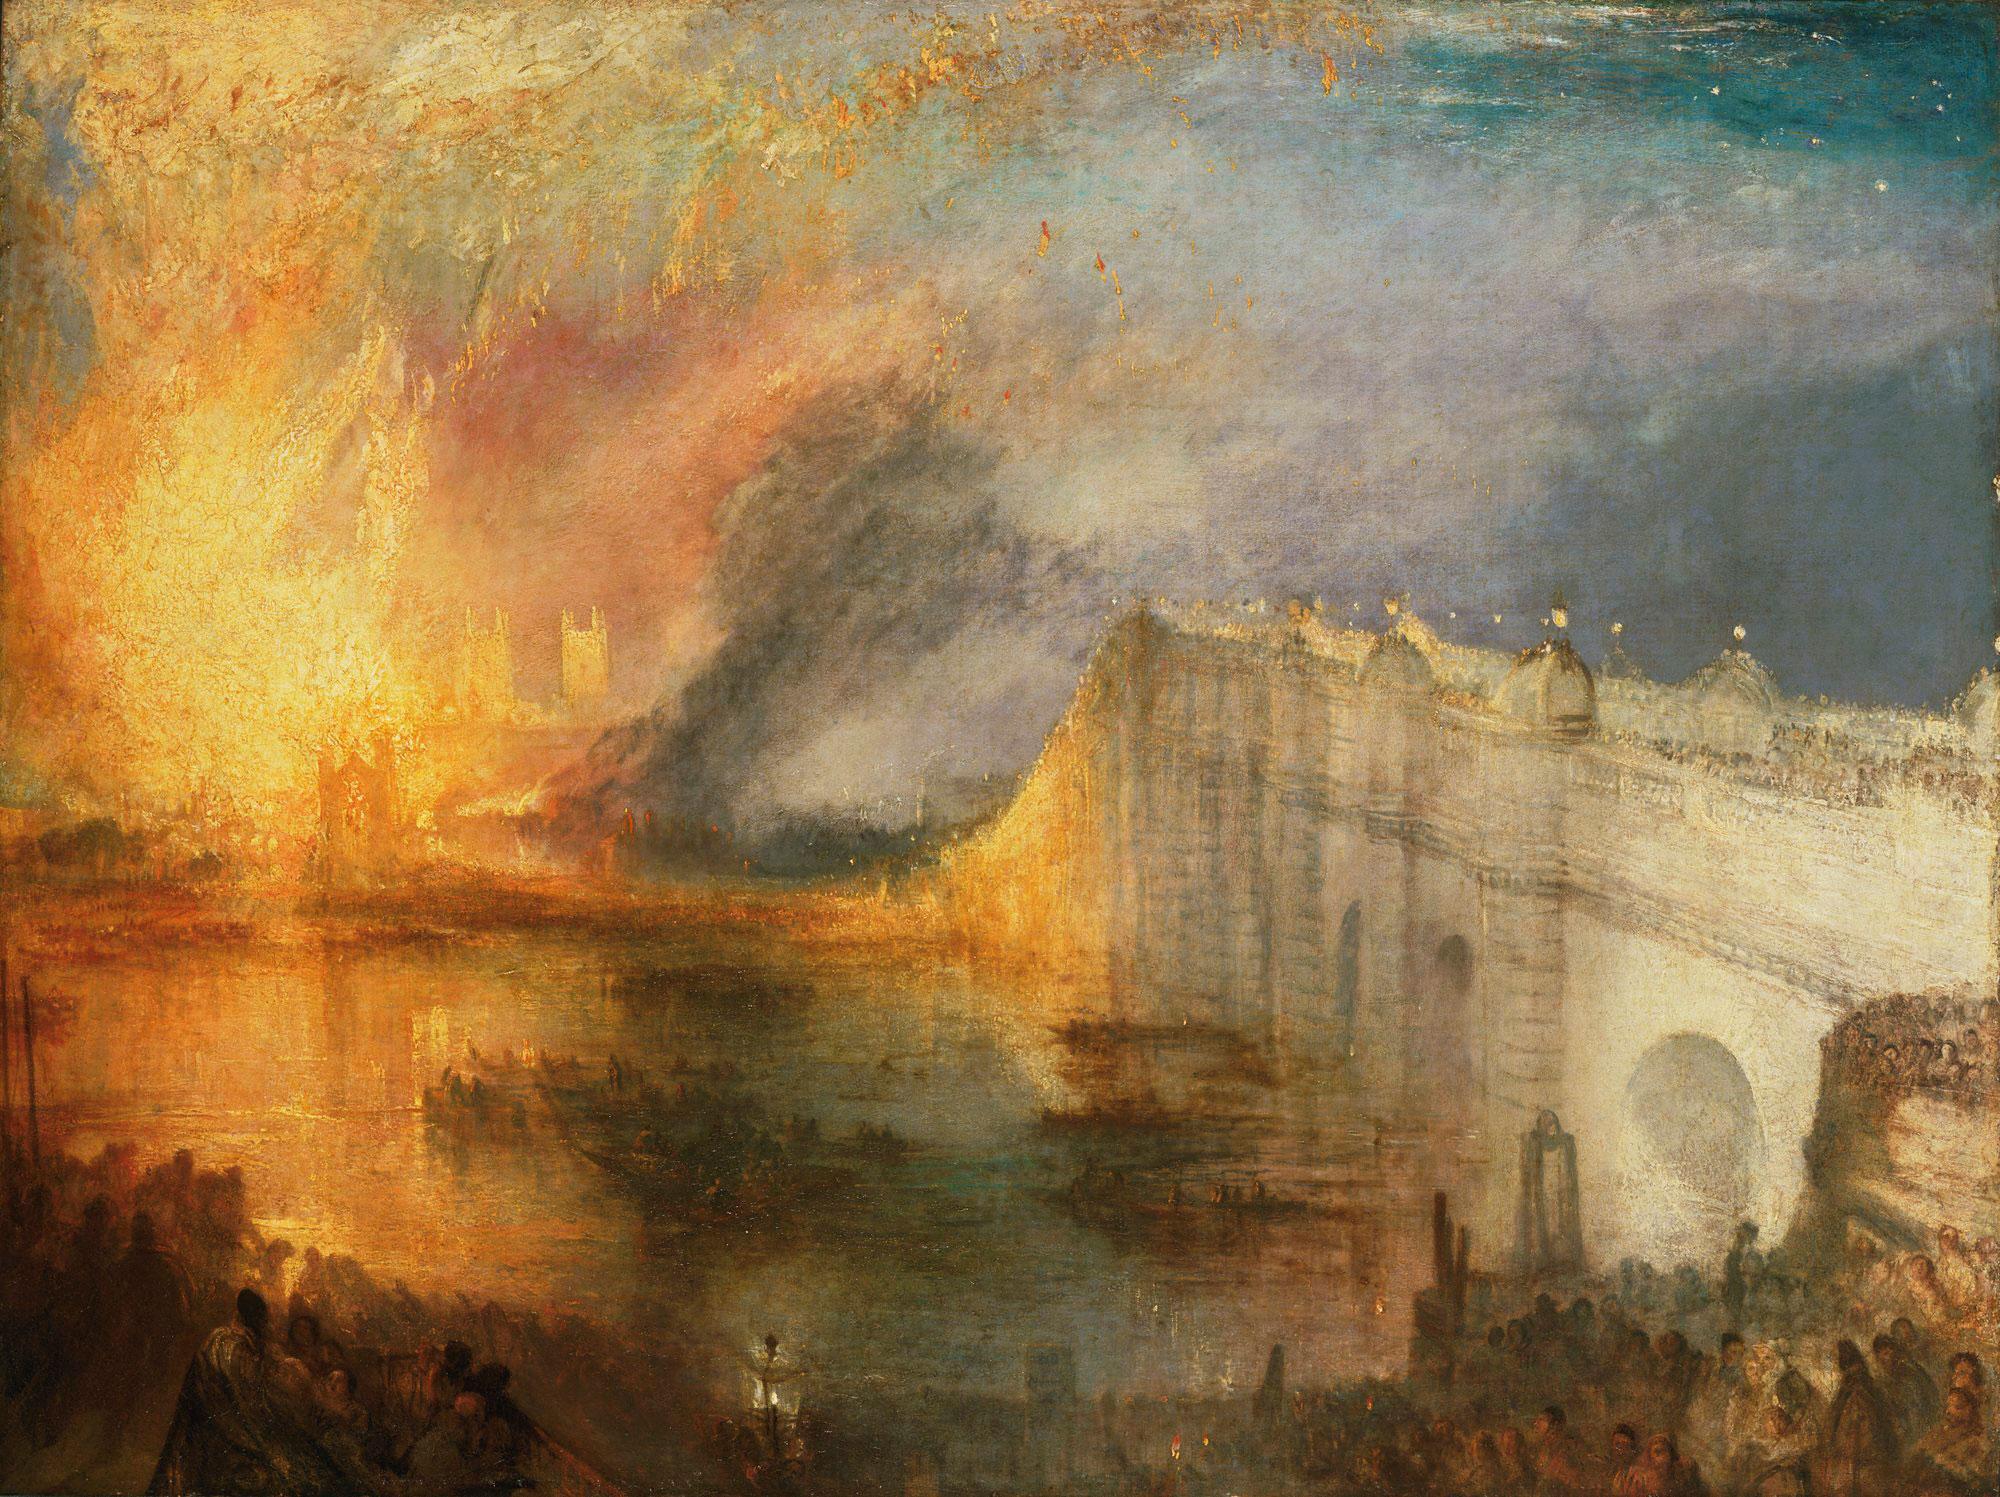 Turner-Burning-PhilaMusArt.jpg